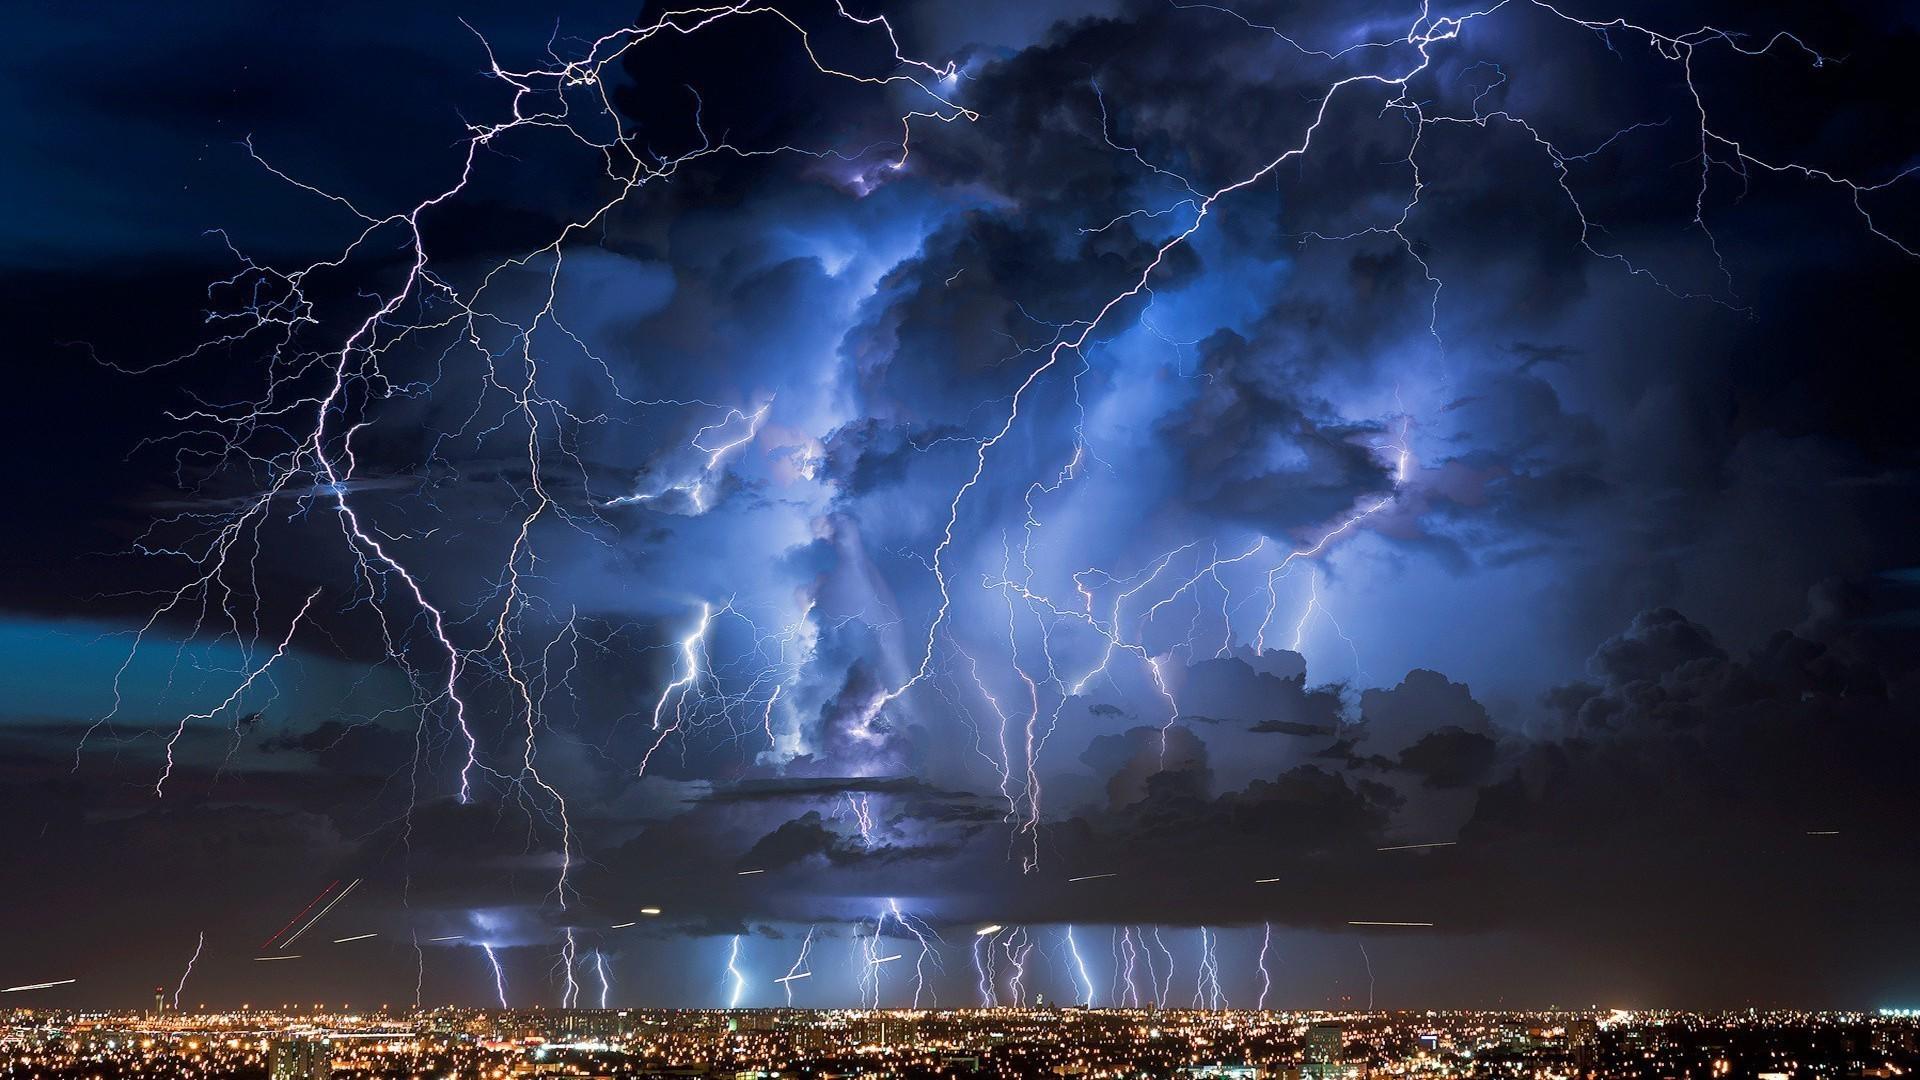 Lightning Wallpapers Hd: Thunderstorm Desktop Wallpaper (61+ Images